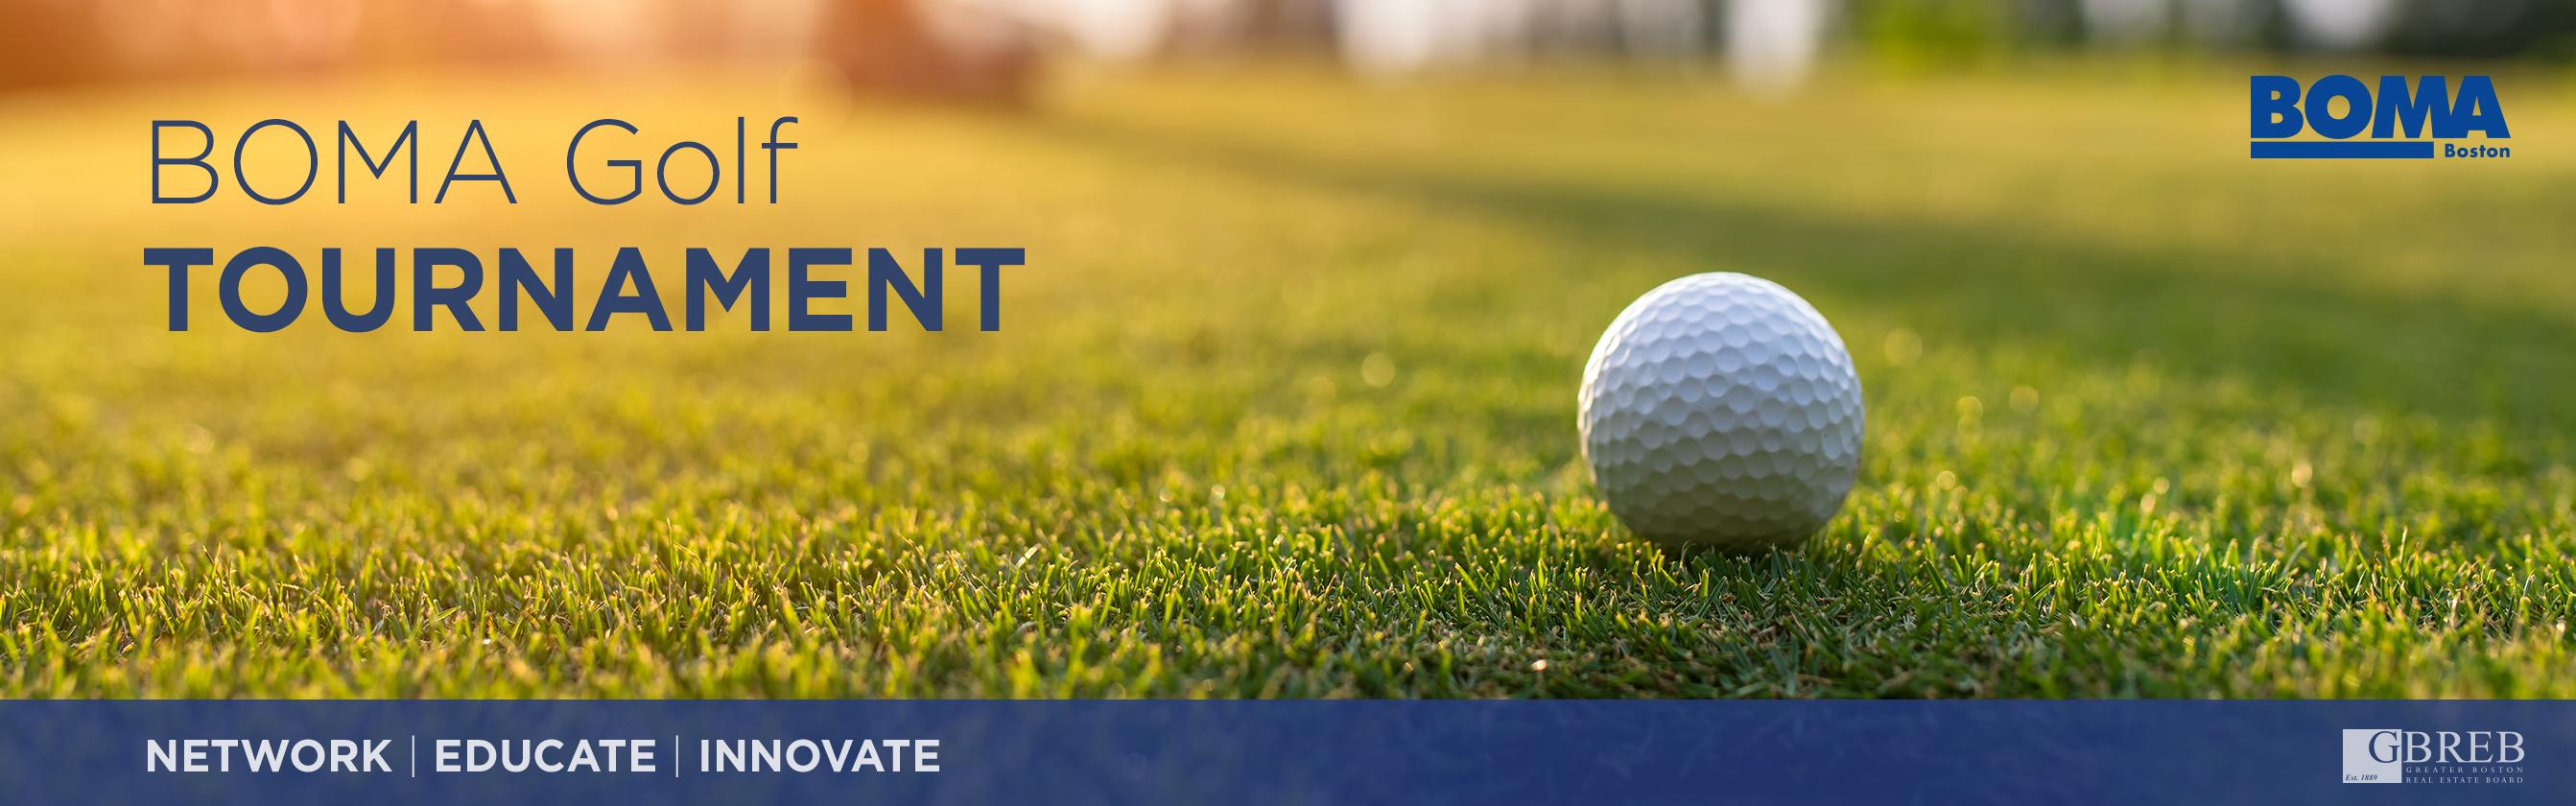 Event Display Boma Golf Tournament